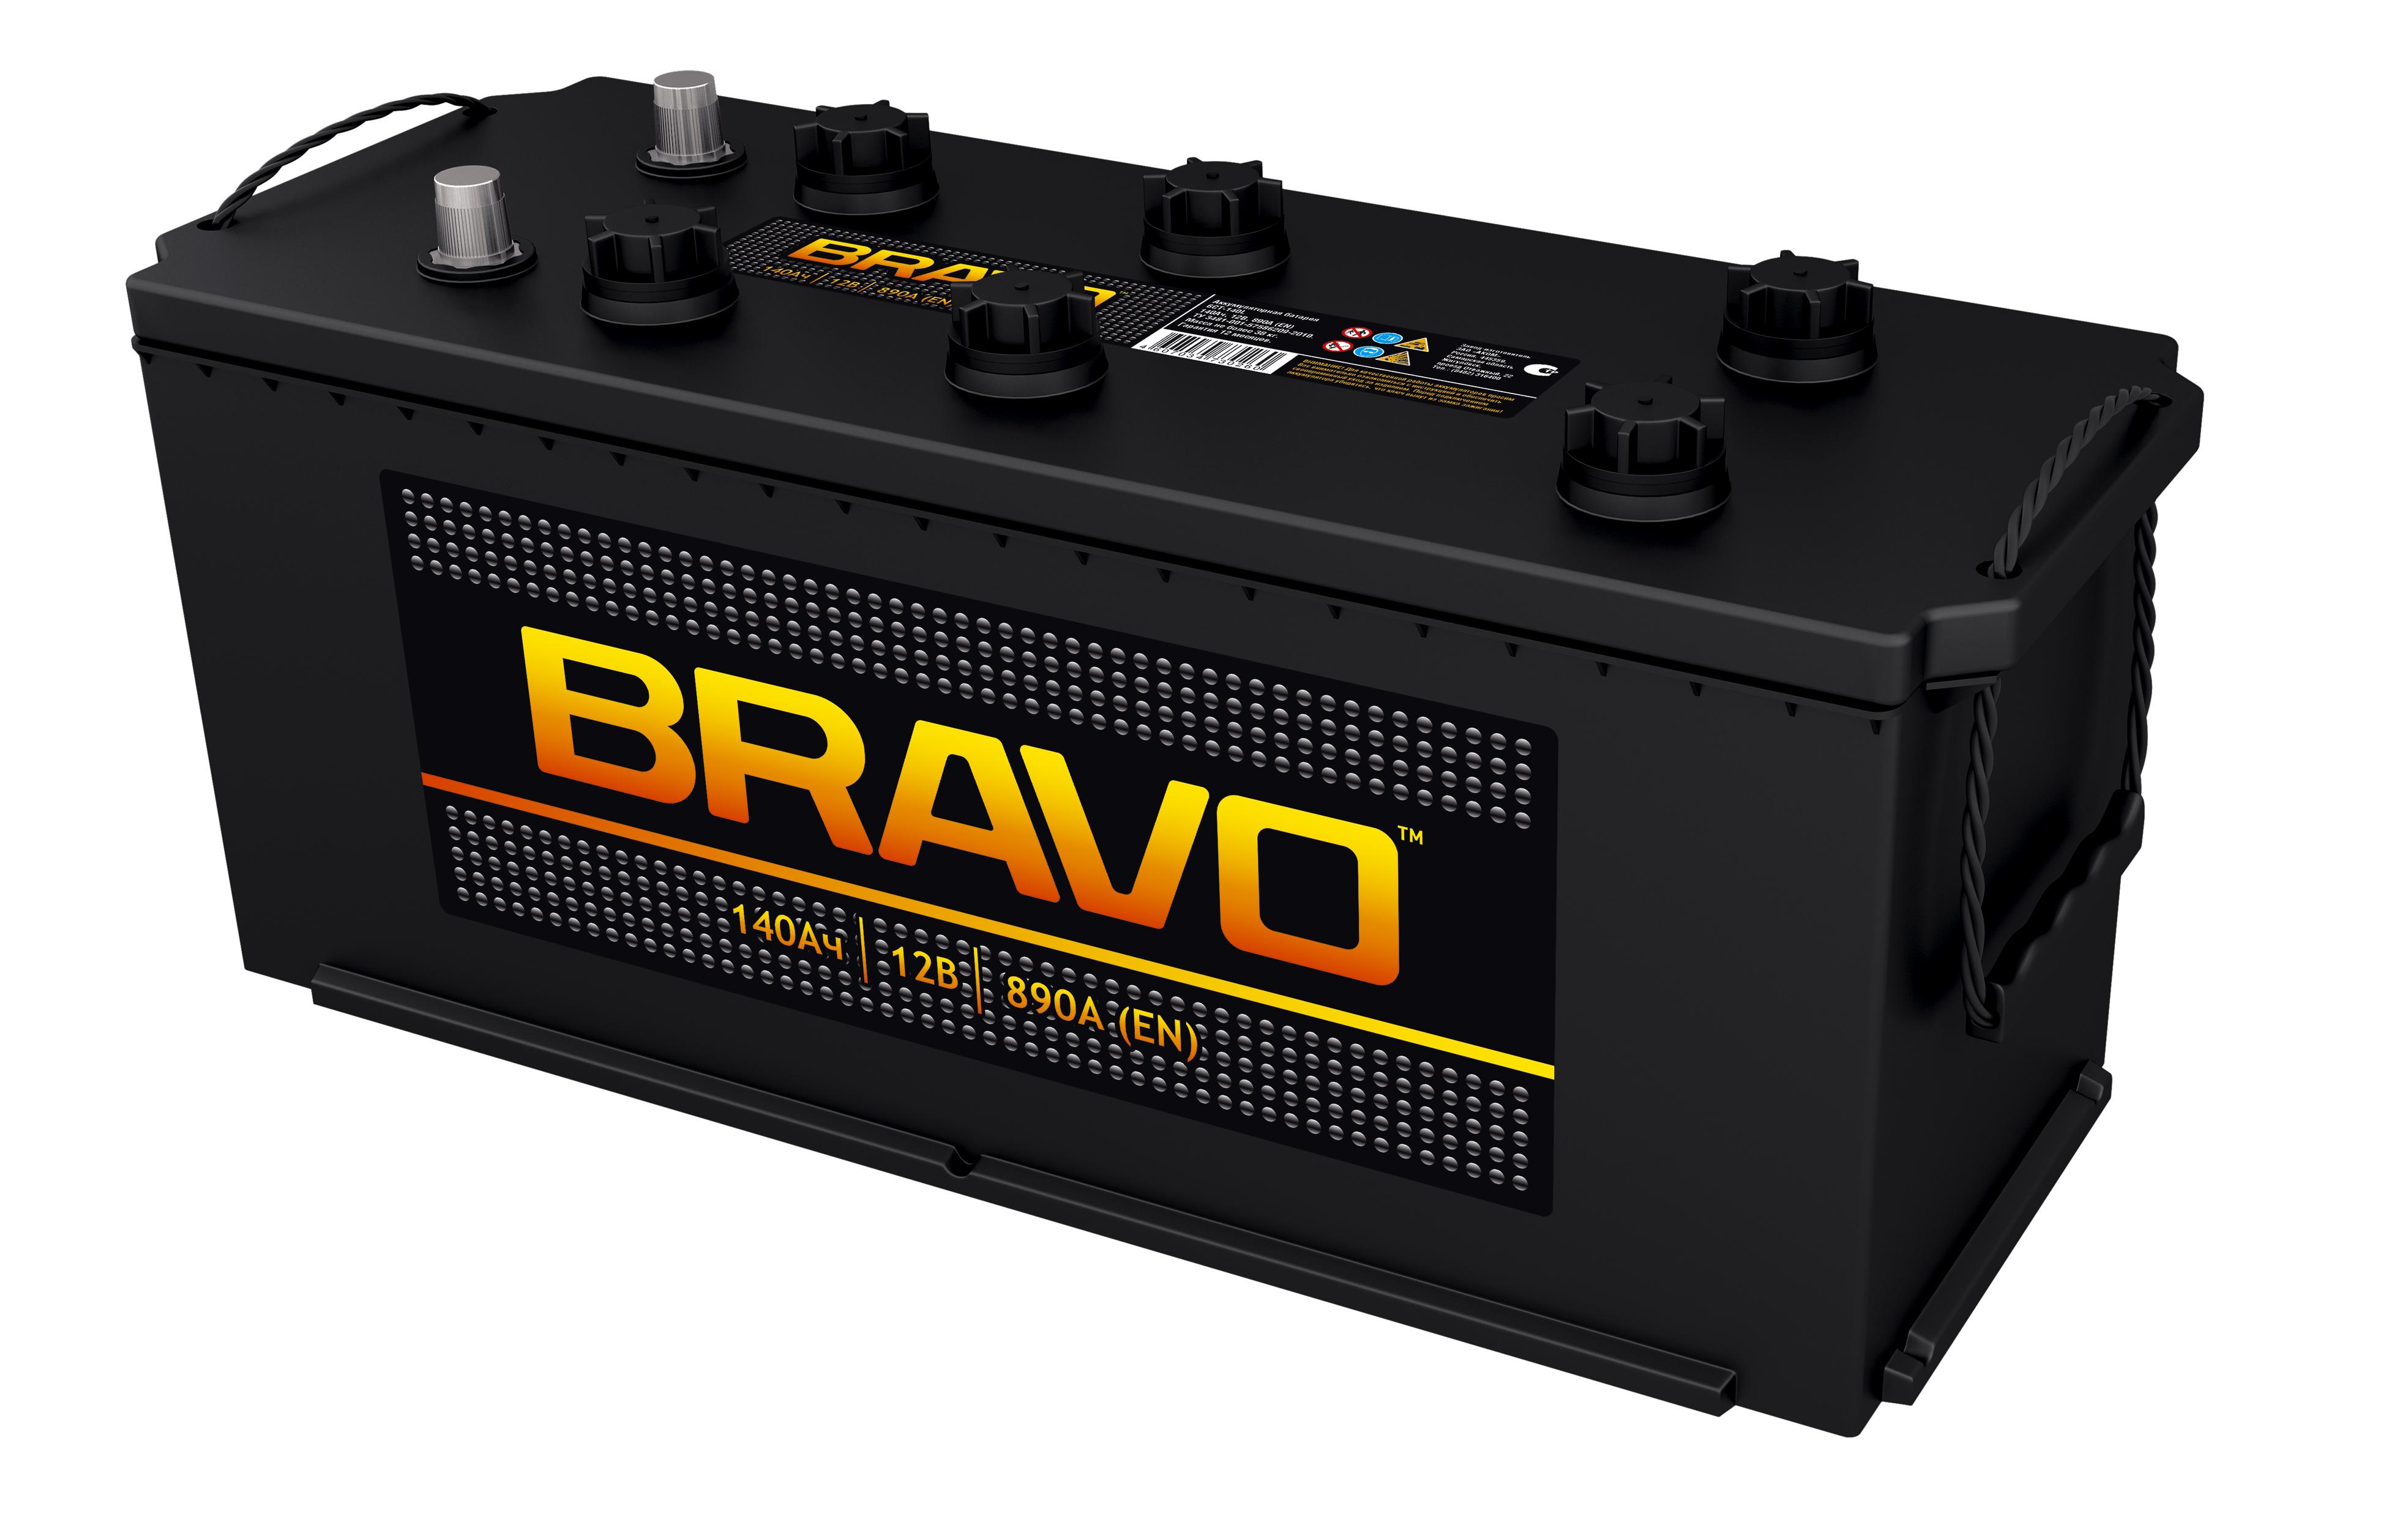 Аккумулятор Аком Bravo 140Ah/890 лев.+ /511x182.5x239/